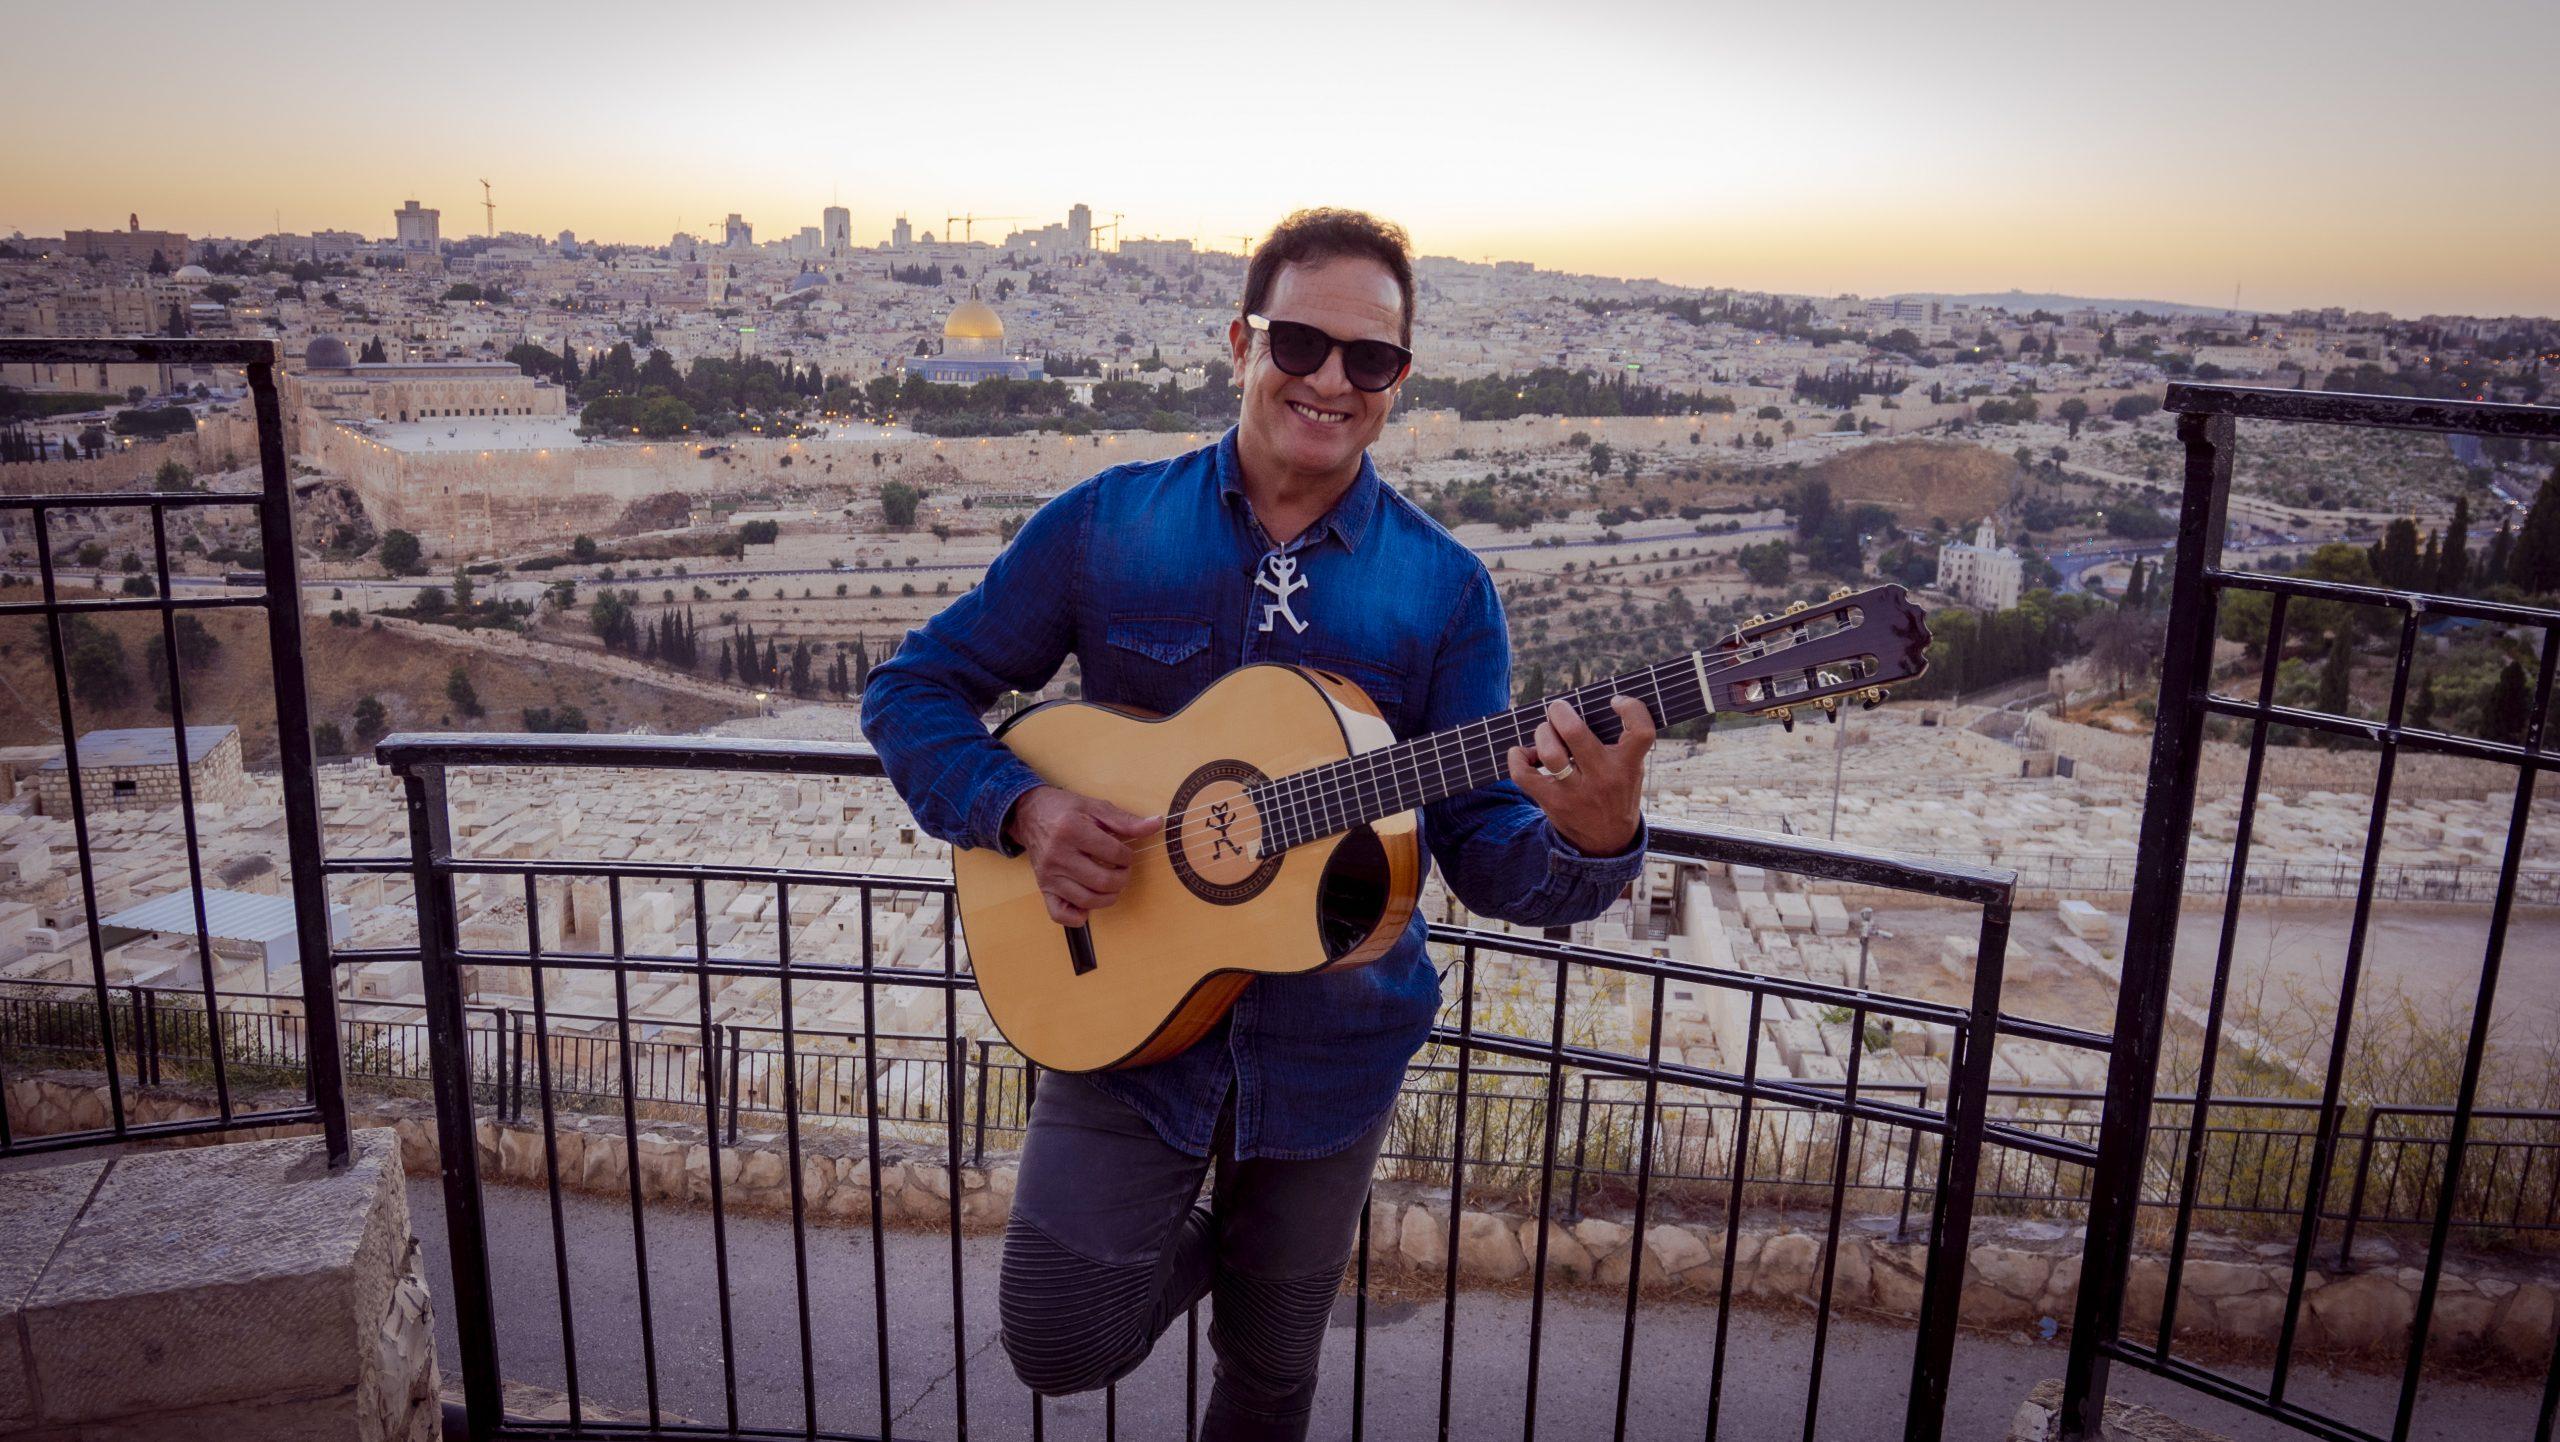 Fernando Seixas canta Jerusalém toda de Ouro